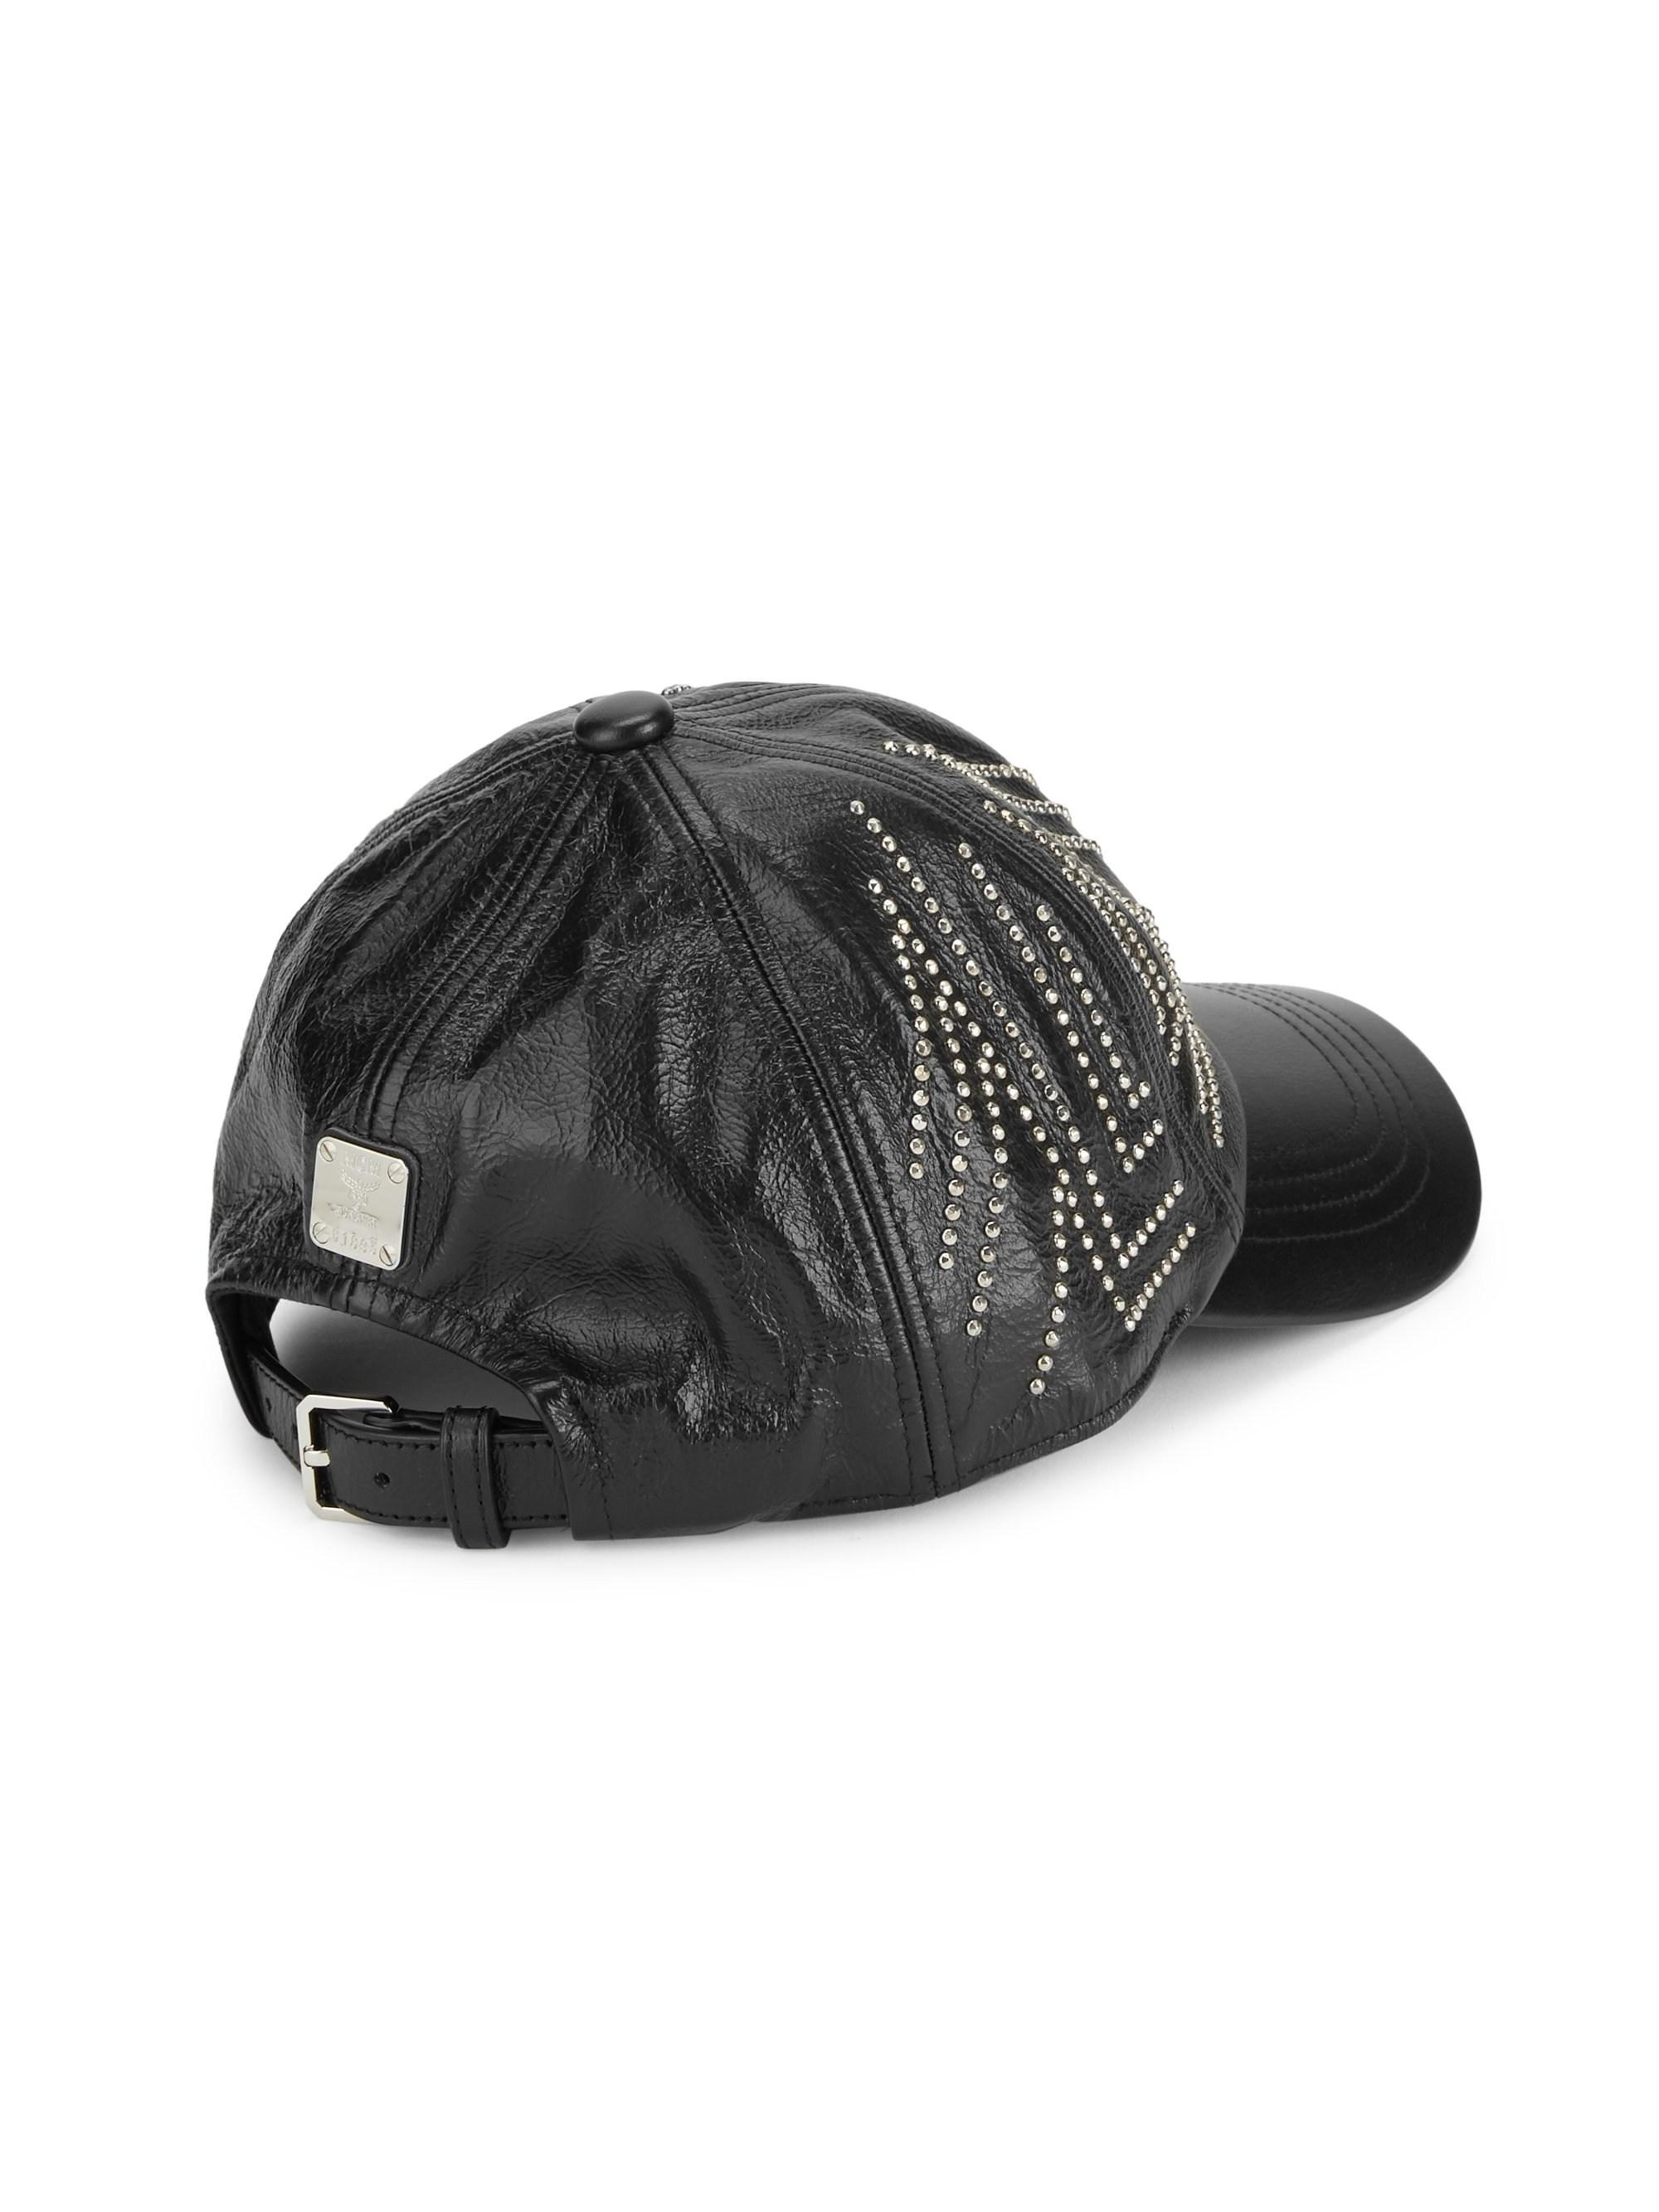 9313e6ea MCM - Black Gunta Stud Leather Baseball Cap for Men - Lyst. View fullscreen